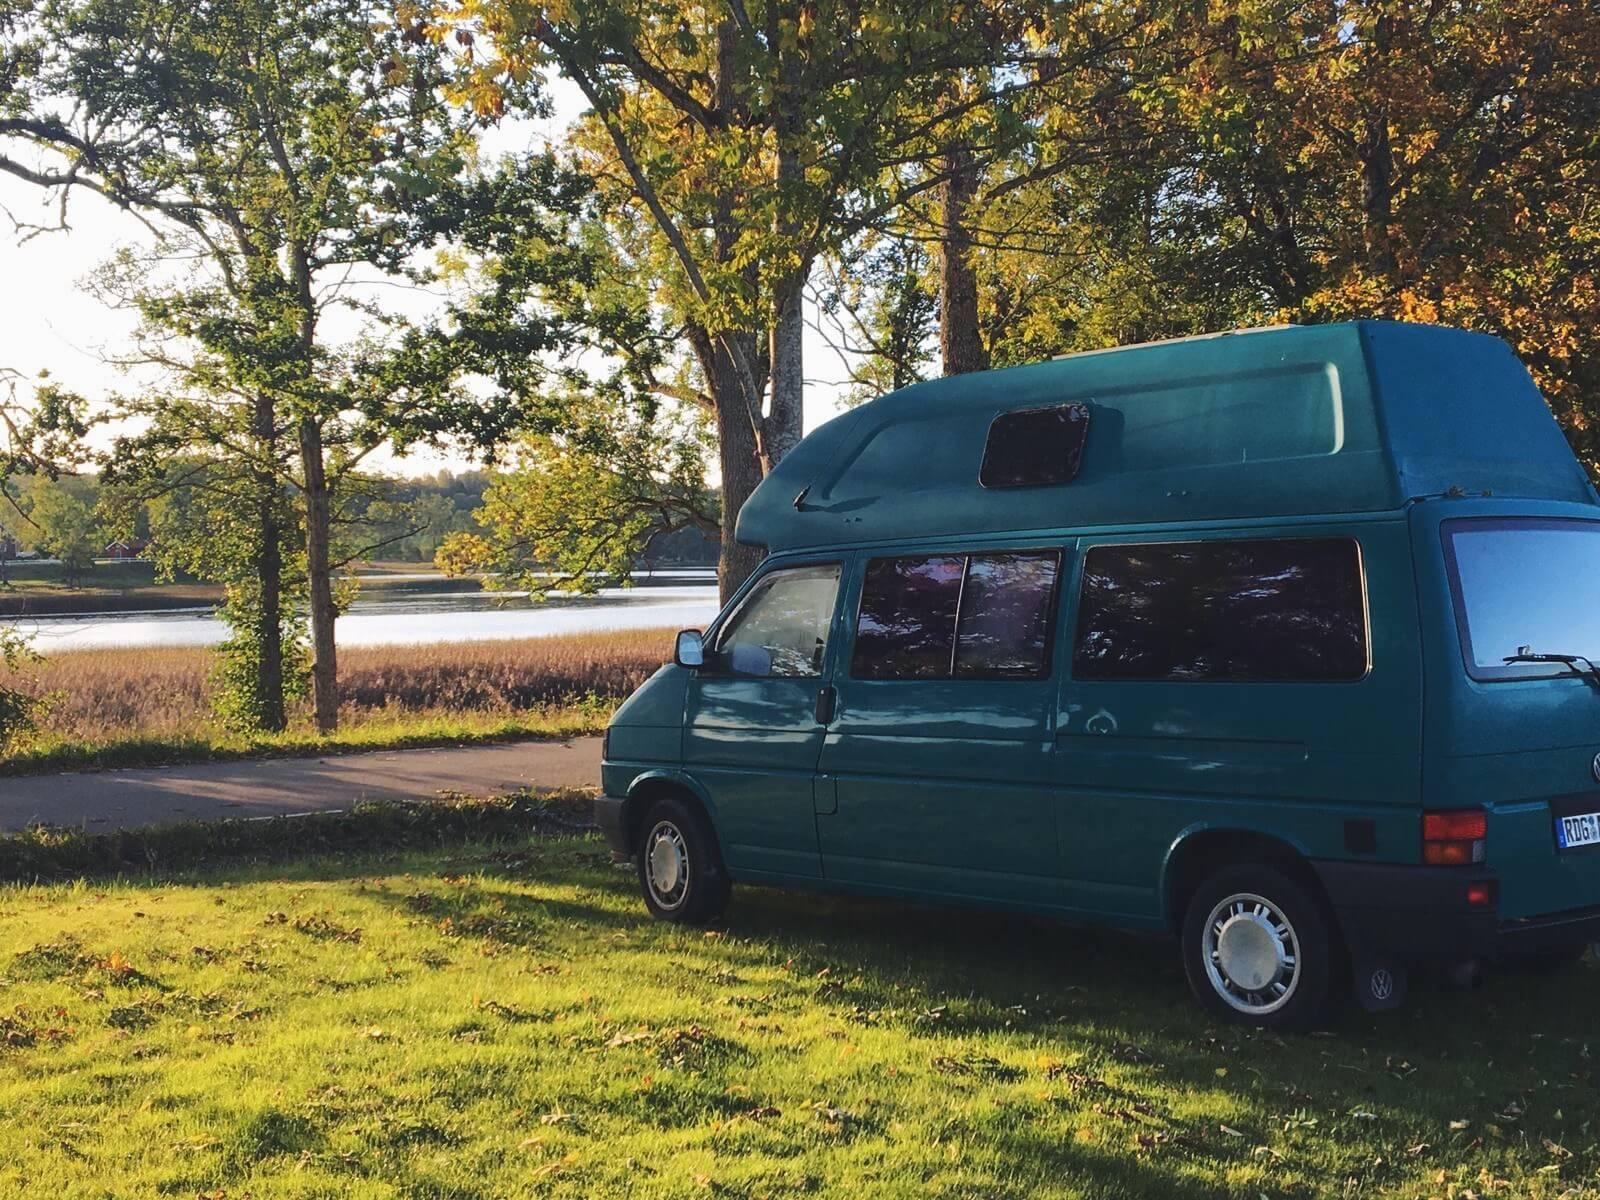 VW Bus T4 Manfred California gruen Camper Bulli mieten Rostock bincampen Seite hinten campen Natur